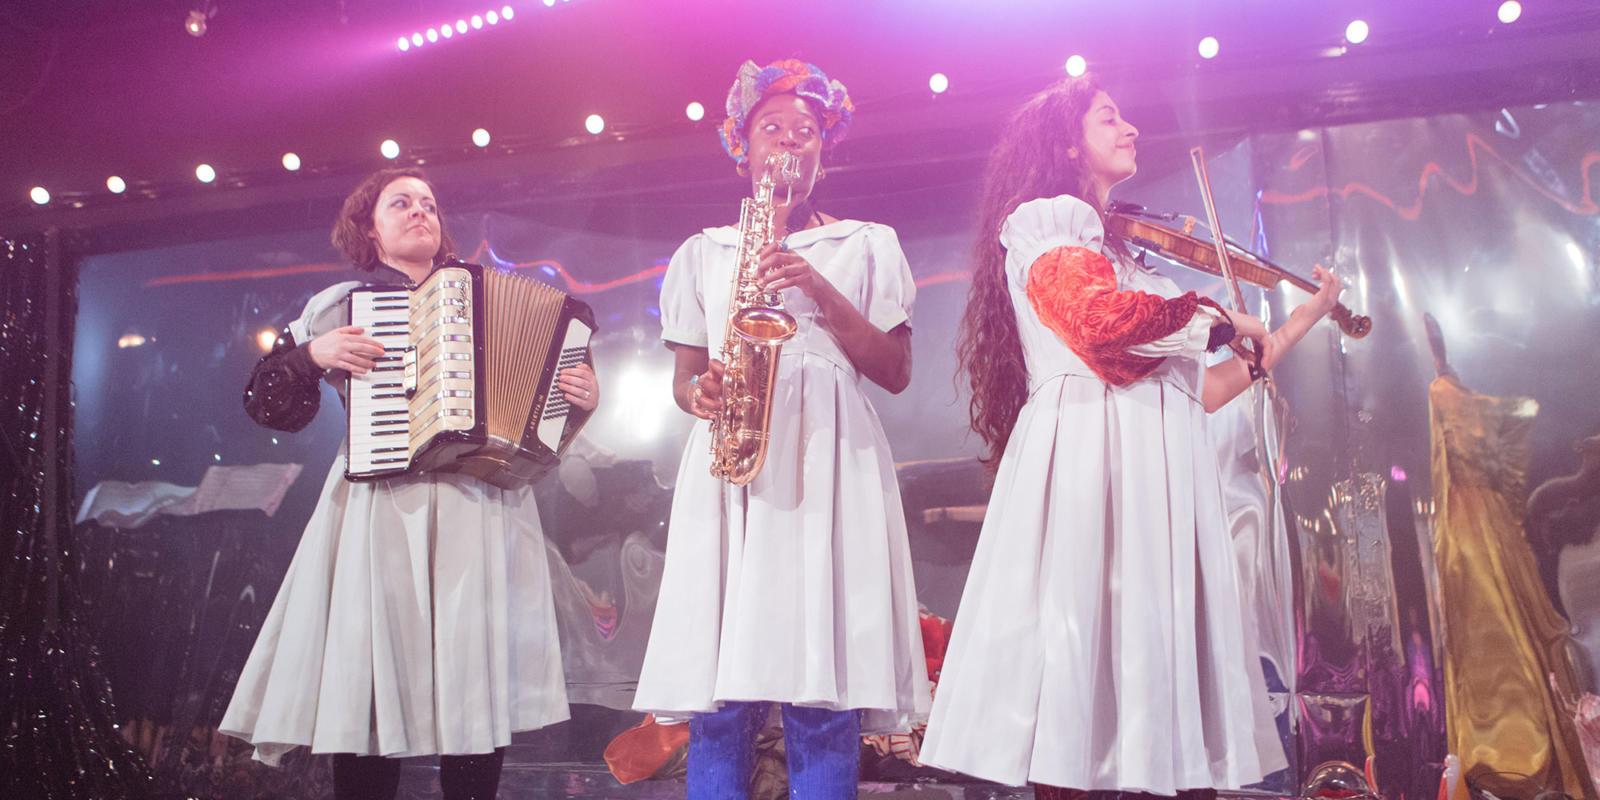 ENO and the Gate Theatre: Effigies of Wickedness musicians Fra Rustumji, Geri Allen, Cassie Kinoshi (c) Helen Murray.